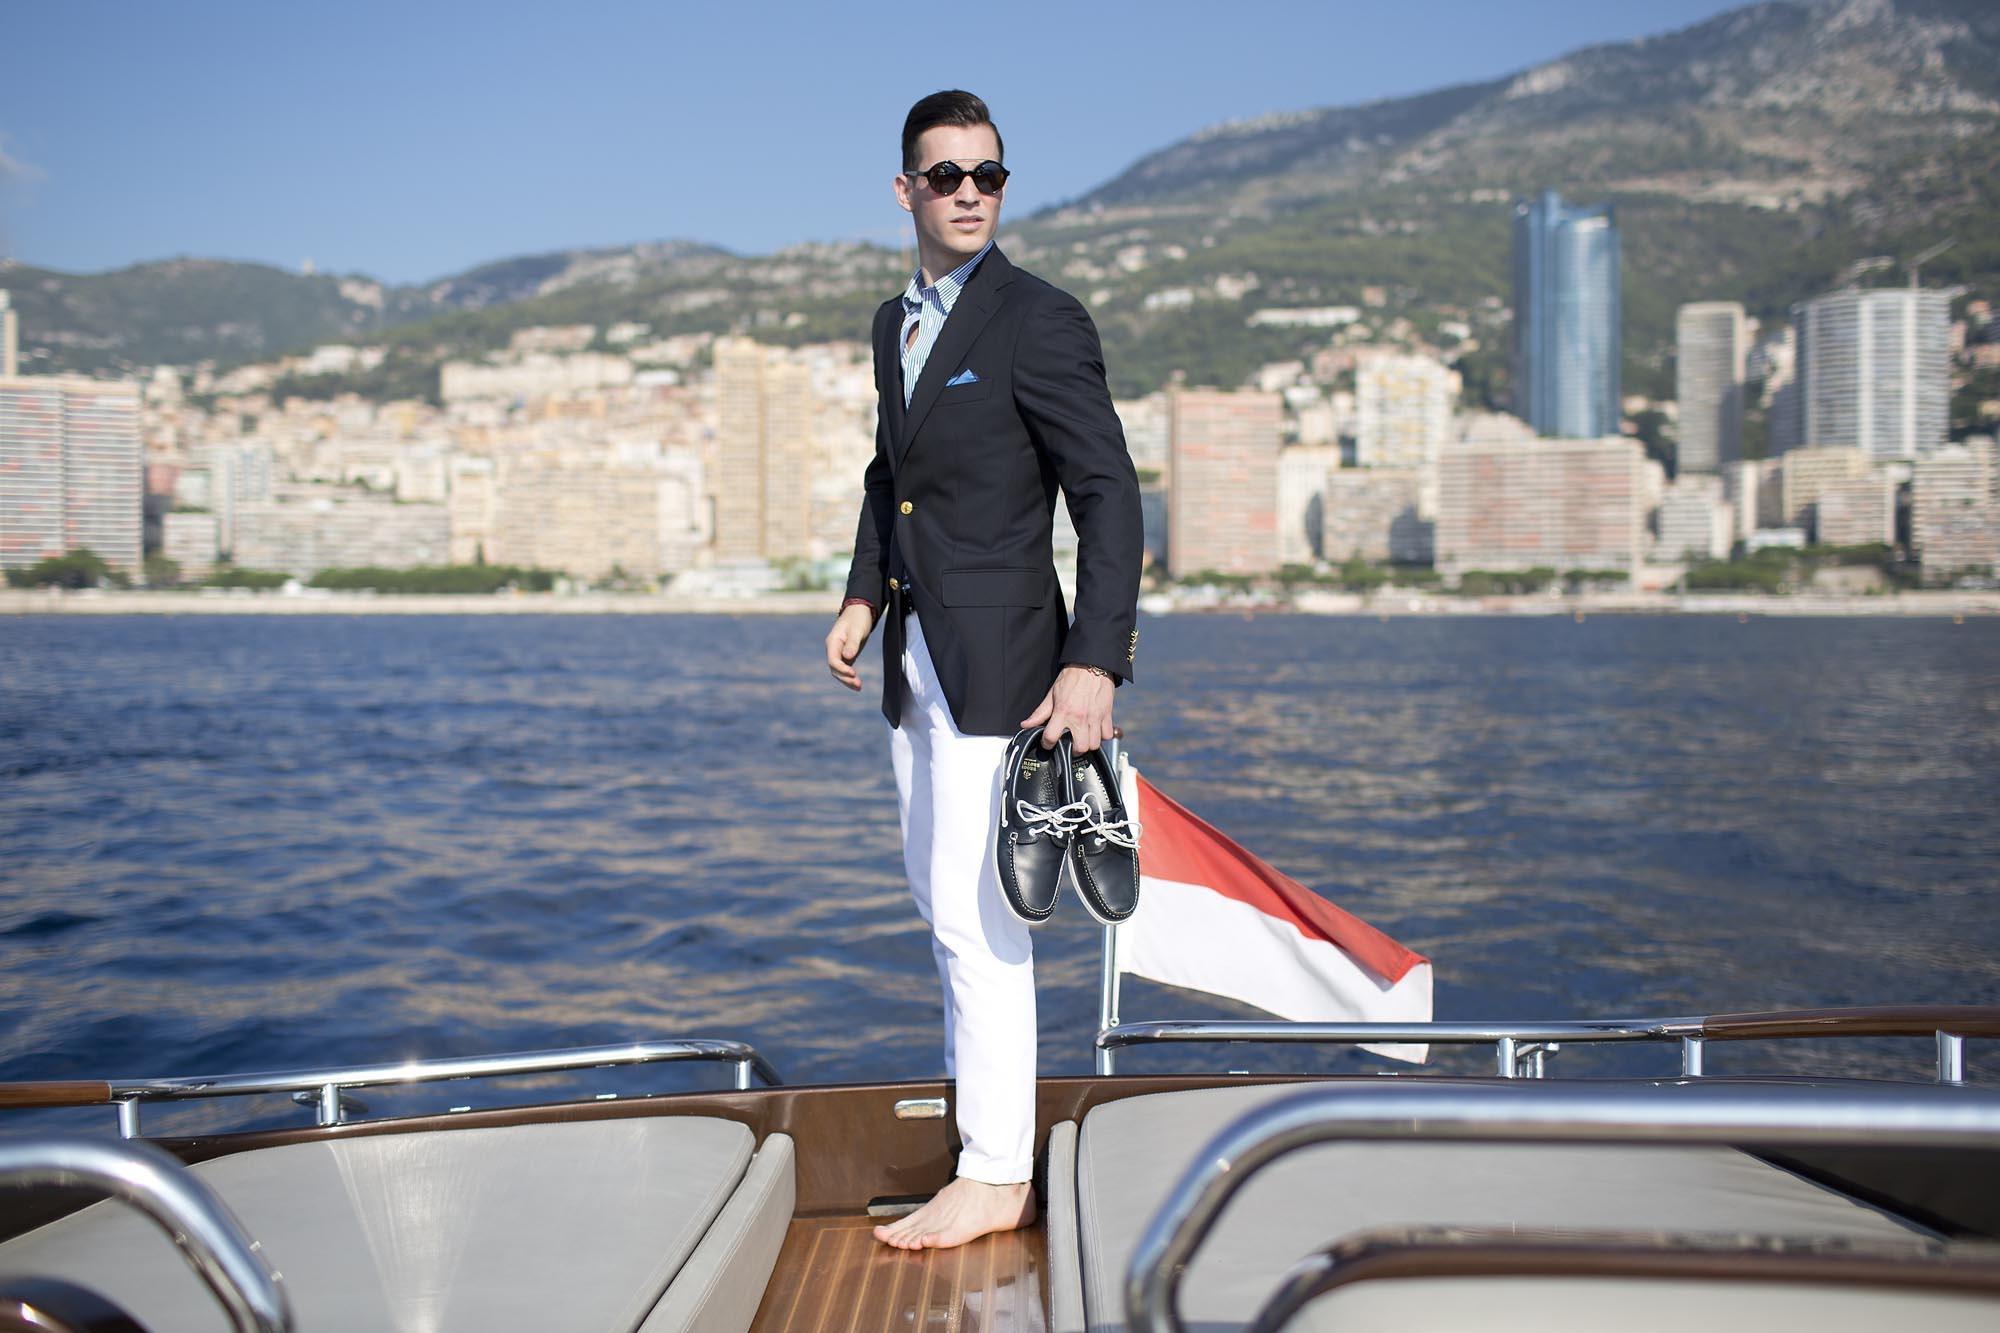 Riva Yacht Brooks Brothers Luxury Fashion Monte Carlo